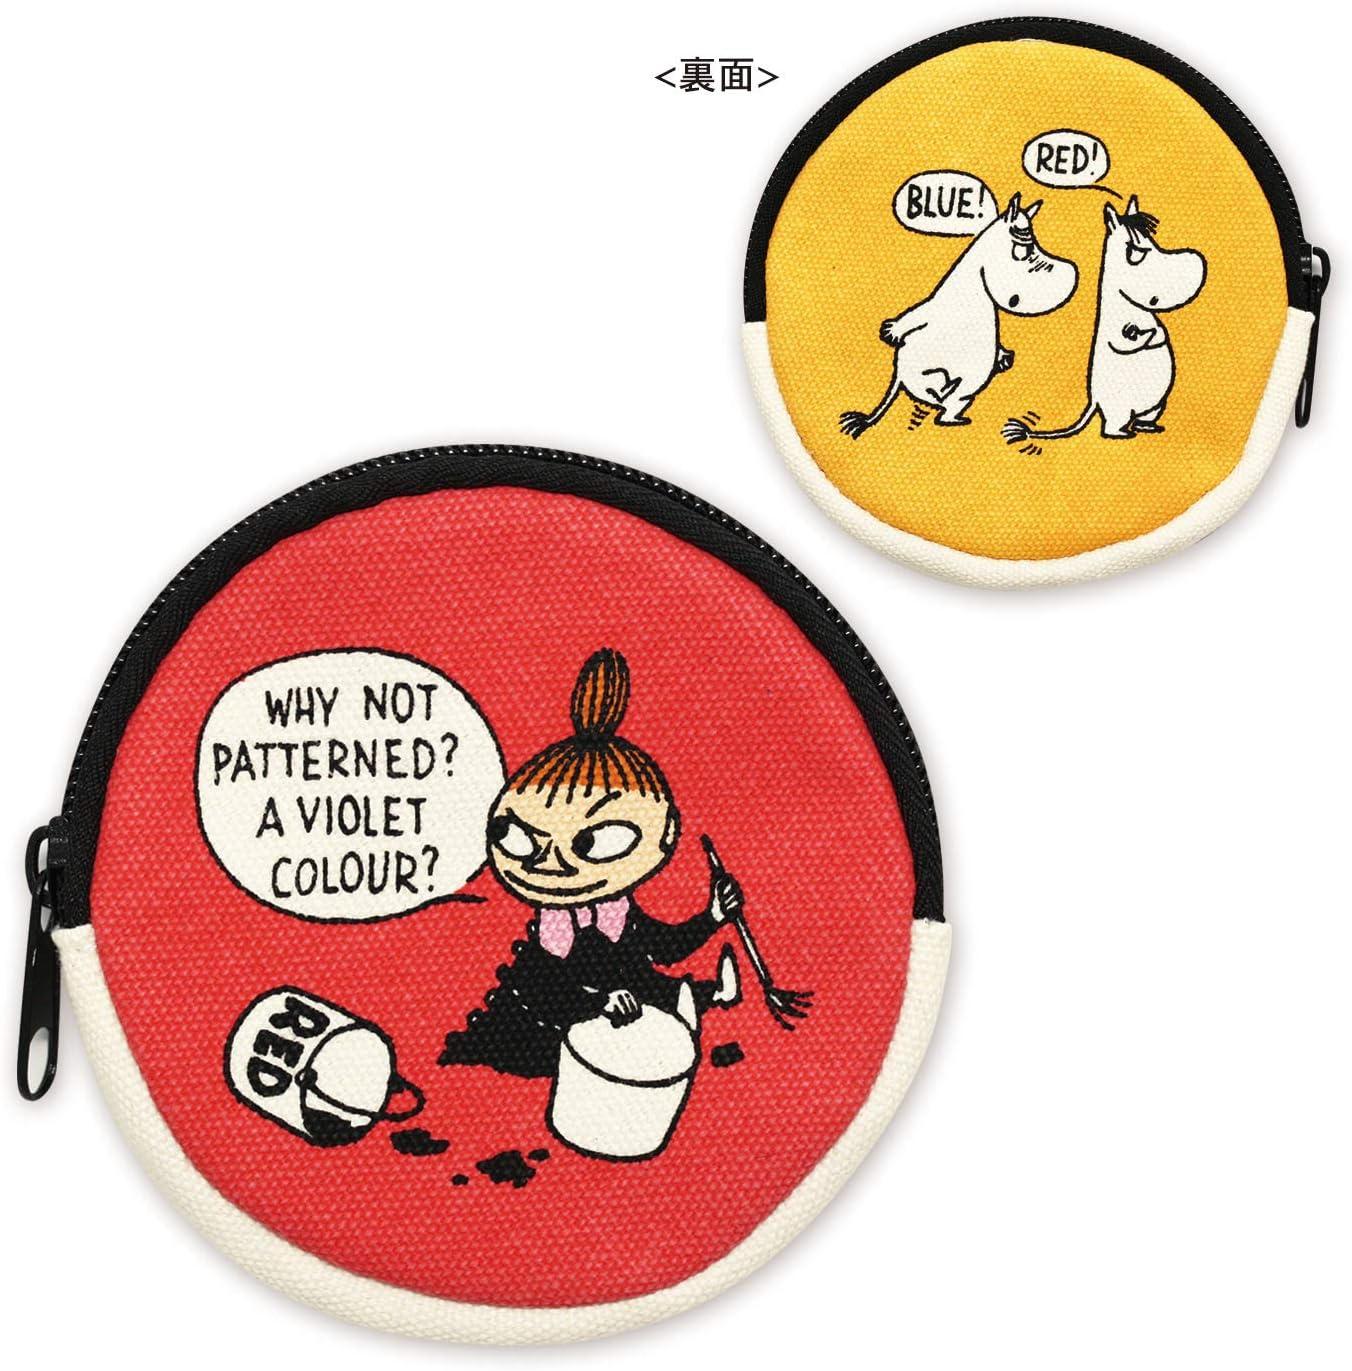 Cirle Moomin Little My Coin Case Coin Purse